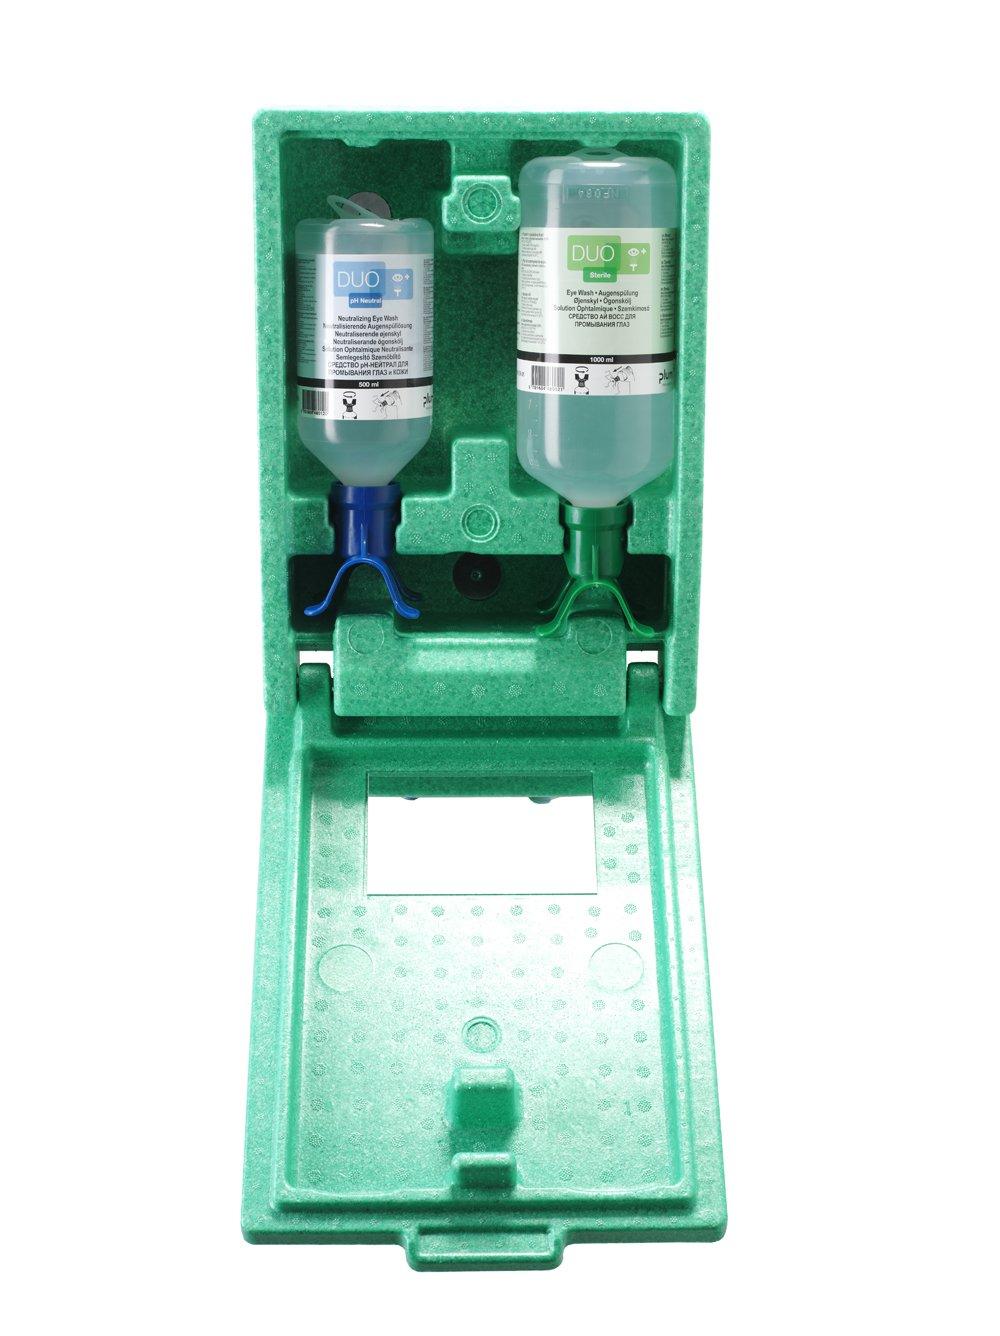 Plum 48108 Medium Duo Chemical Eyewash Station, 5' Height, 10.5' Wide, 14.5' Length, 33.8 fl.oz. Volume, 4.75 lb, Plastic 5 Height 10.5 Wide 14.5 Length